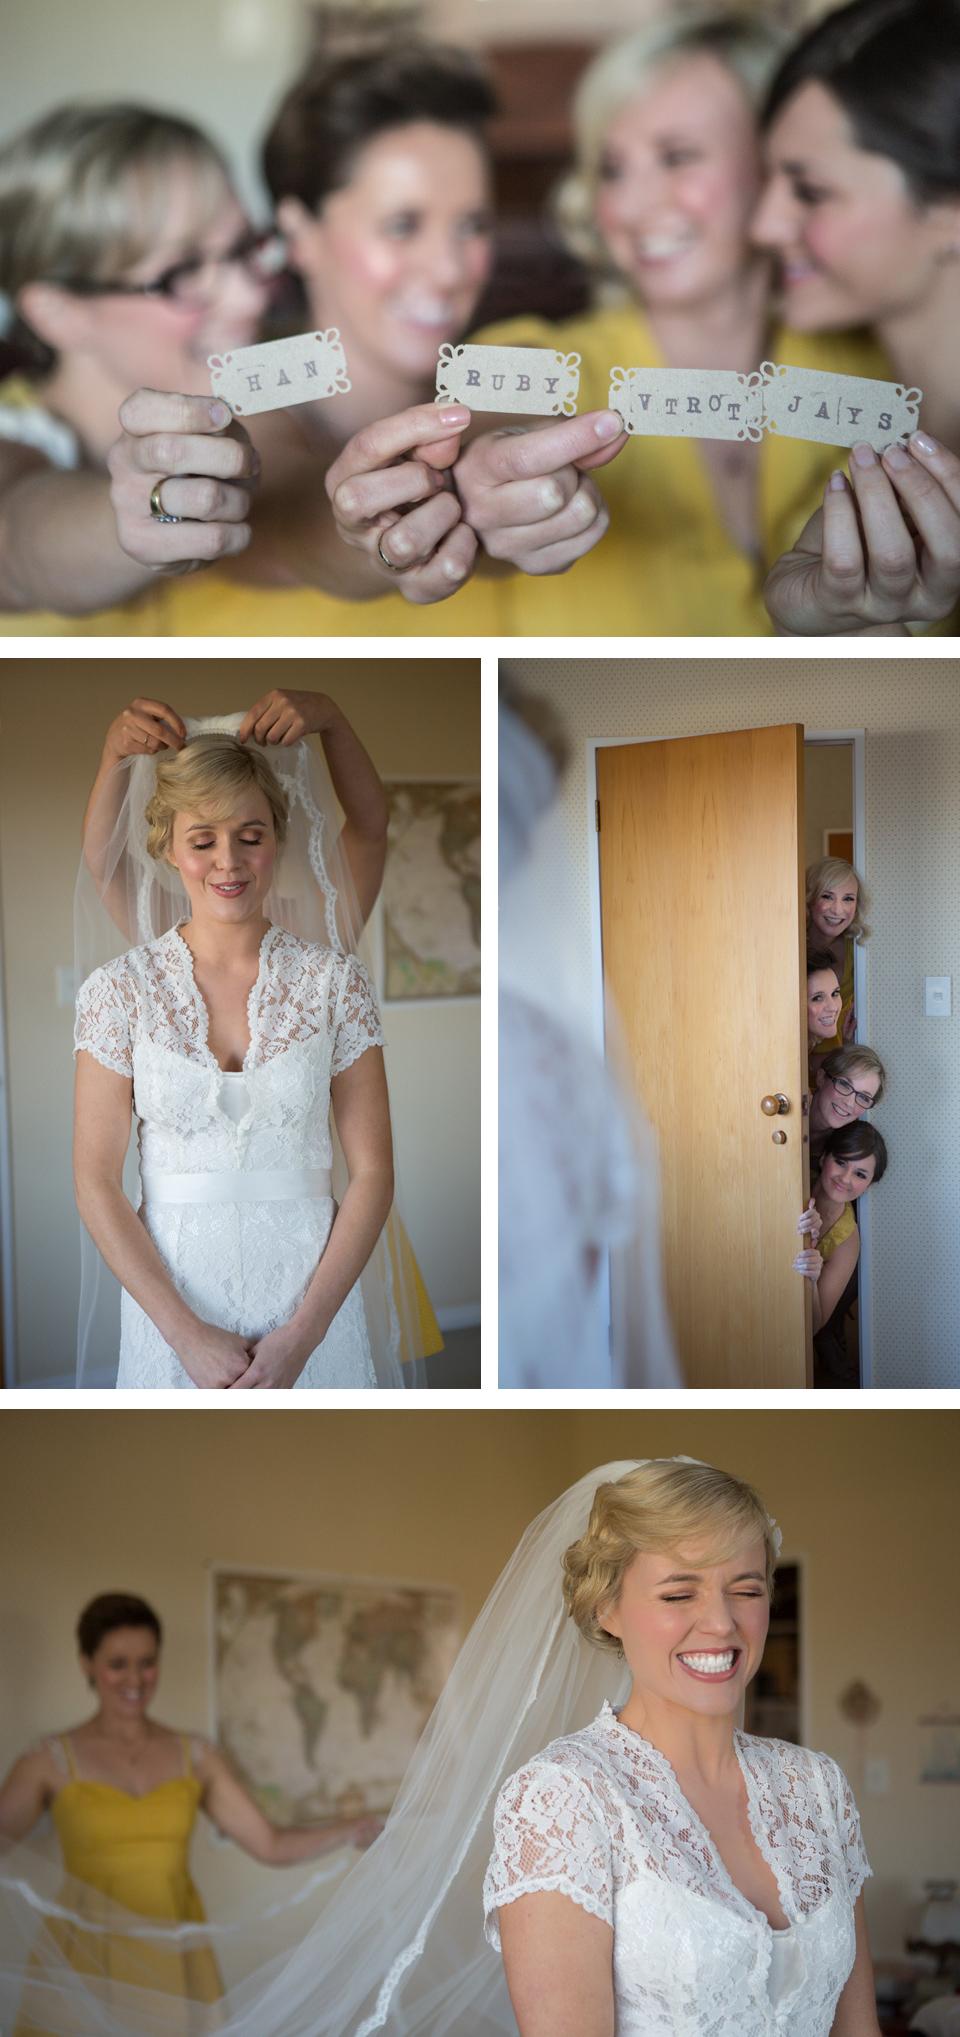 The-Old-Church-wedding-venues-Eva-Bradley (3)